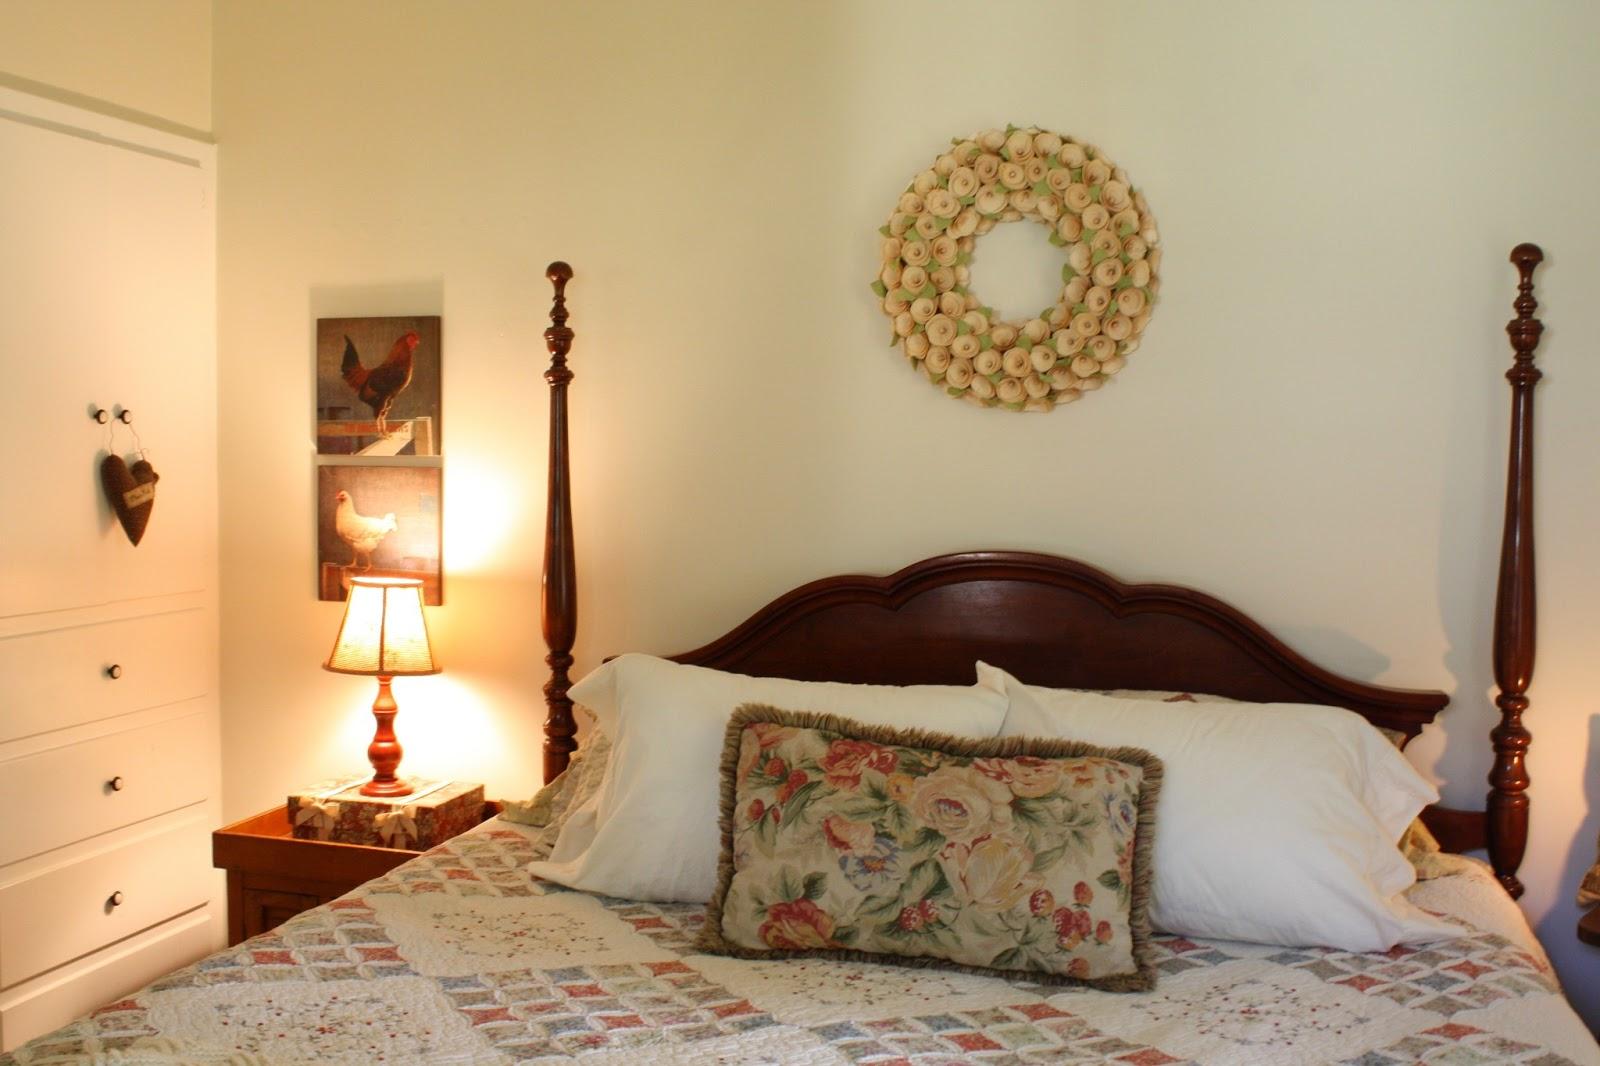 Sunny Simple Life: A New Cozy Corner